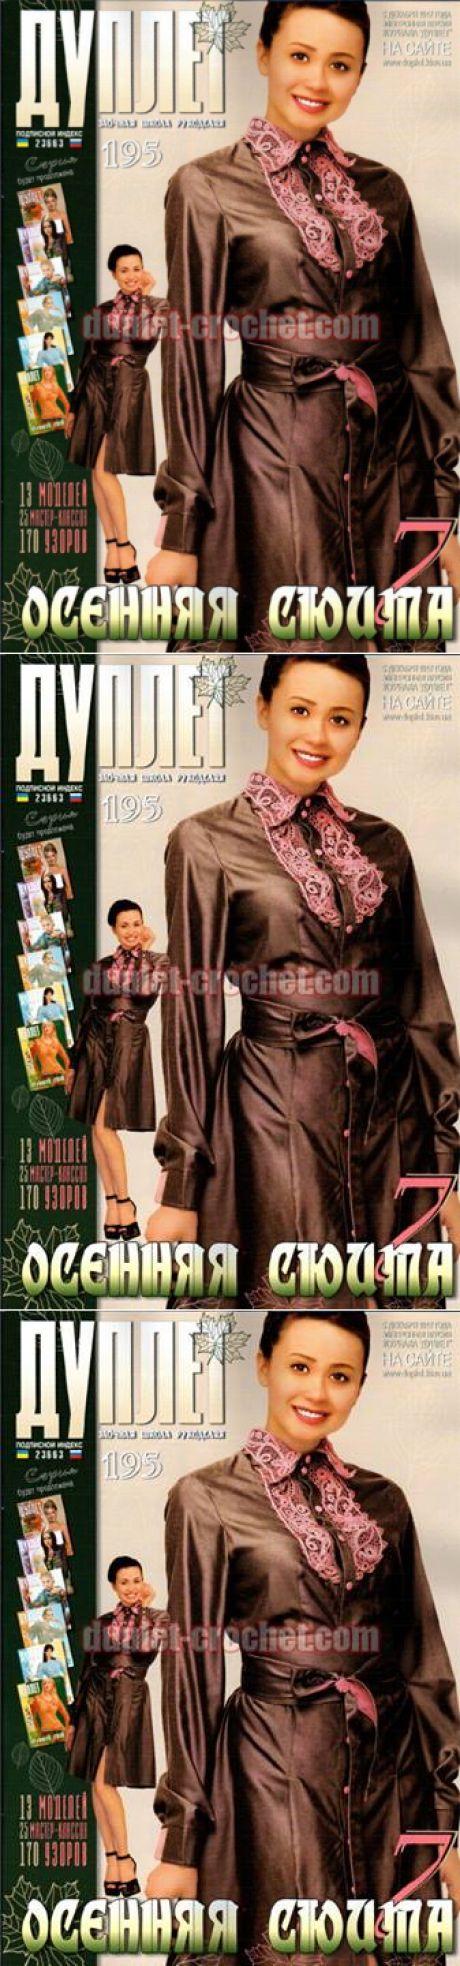 (55) Revistas Duplet, Zhurnal MOD Russian Crochet Revistas - Página inicial